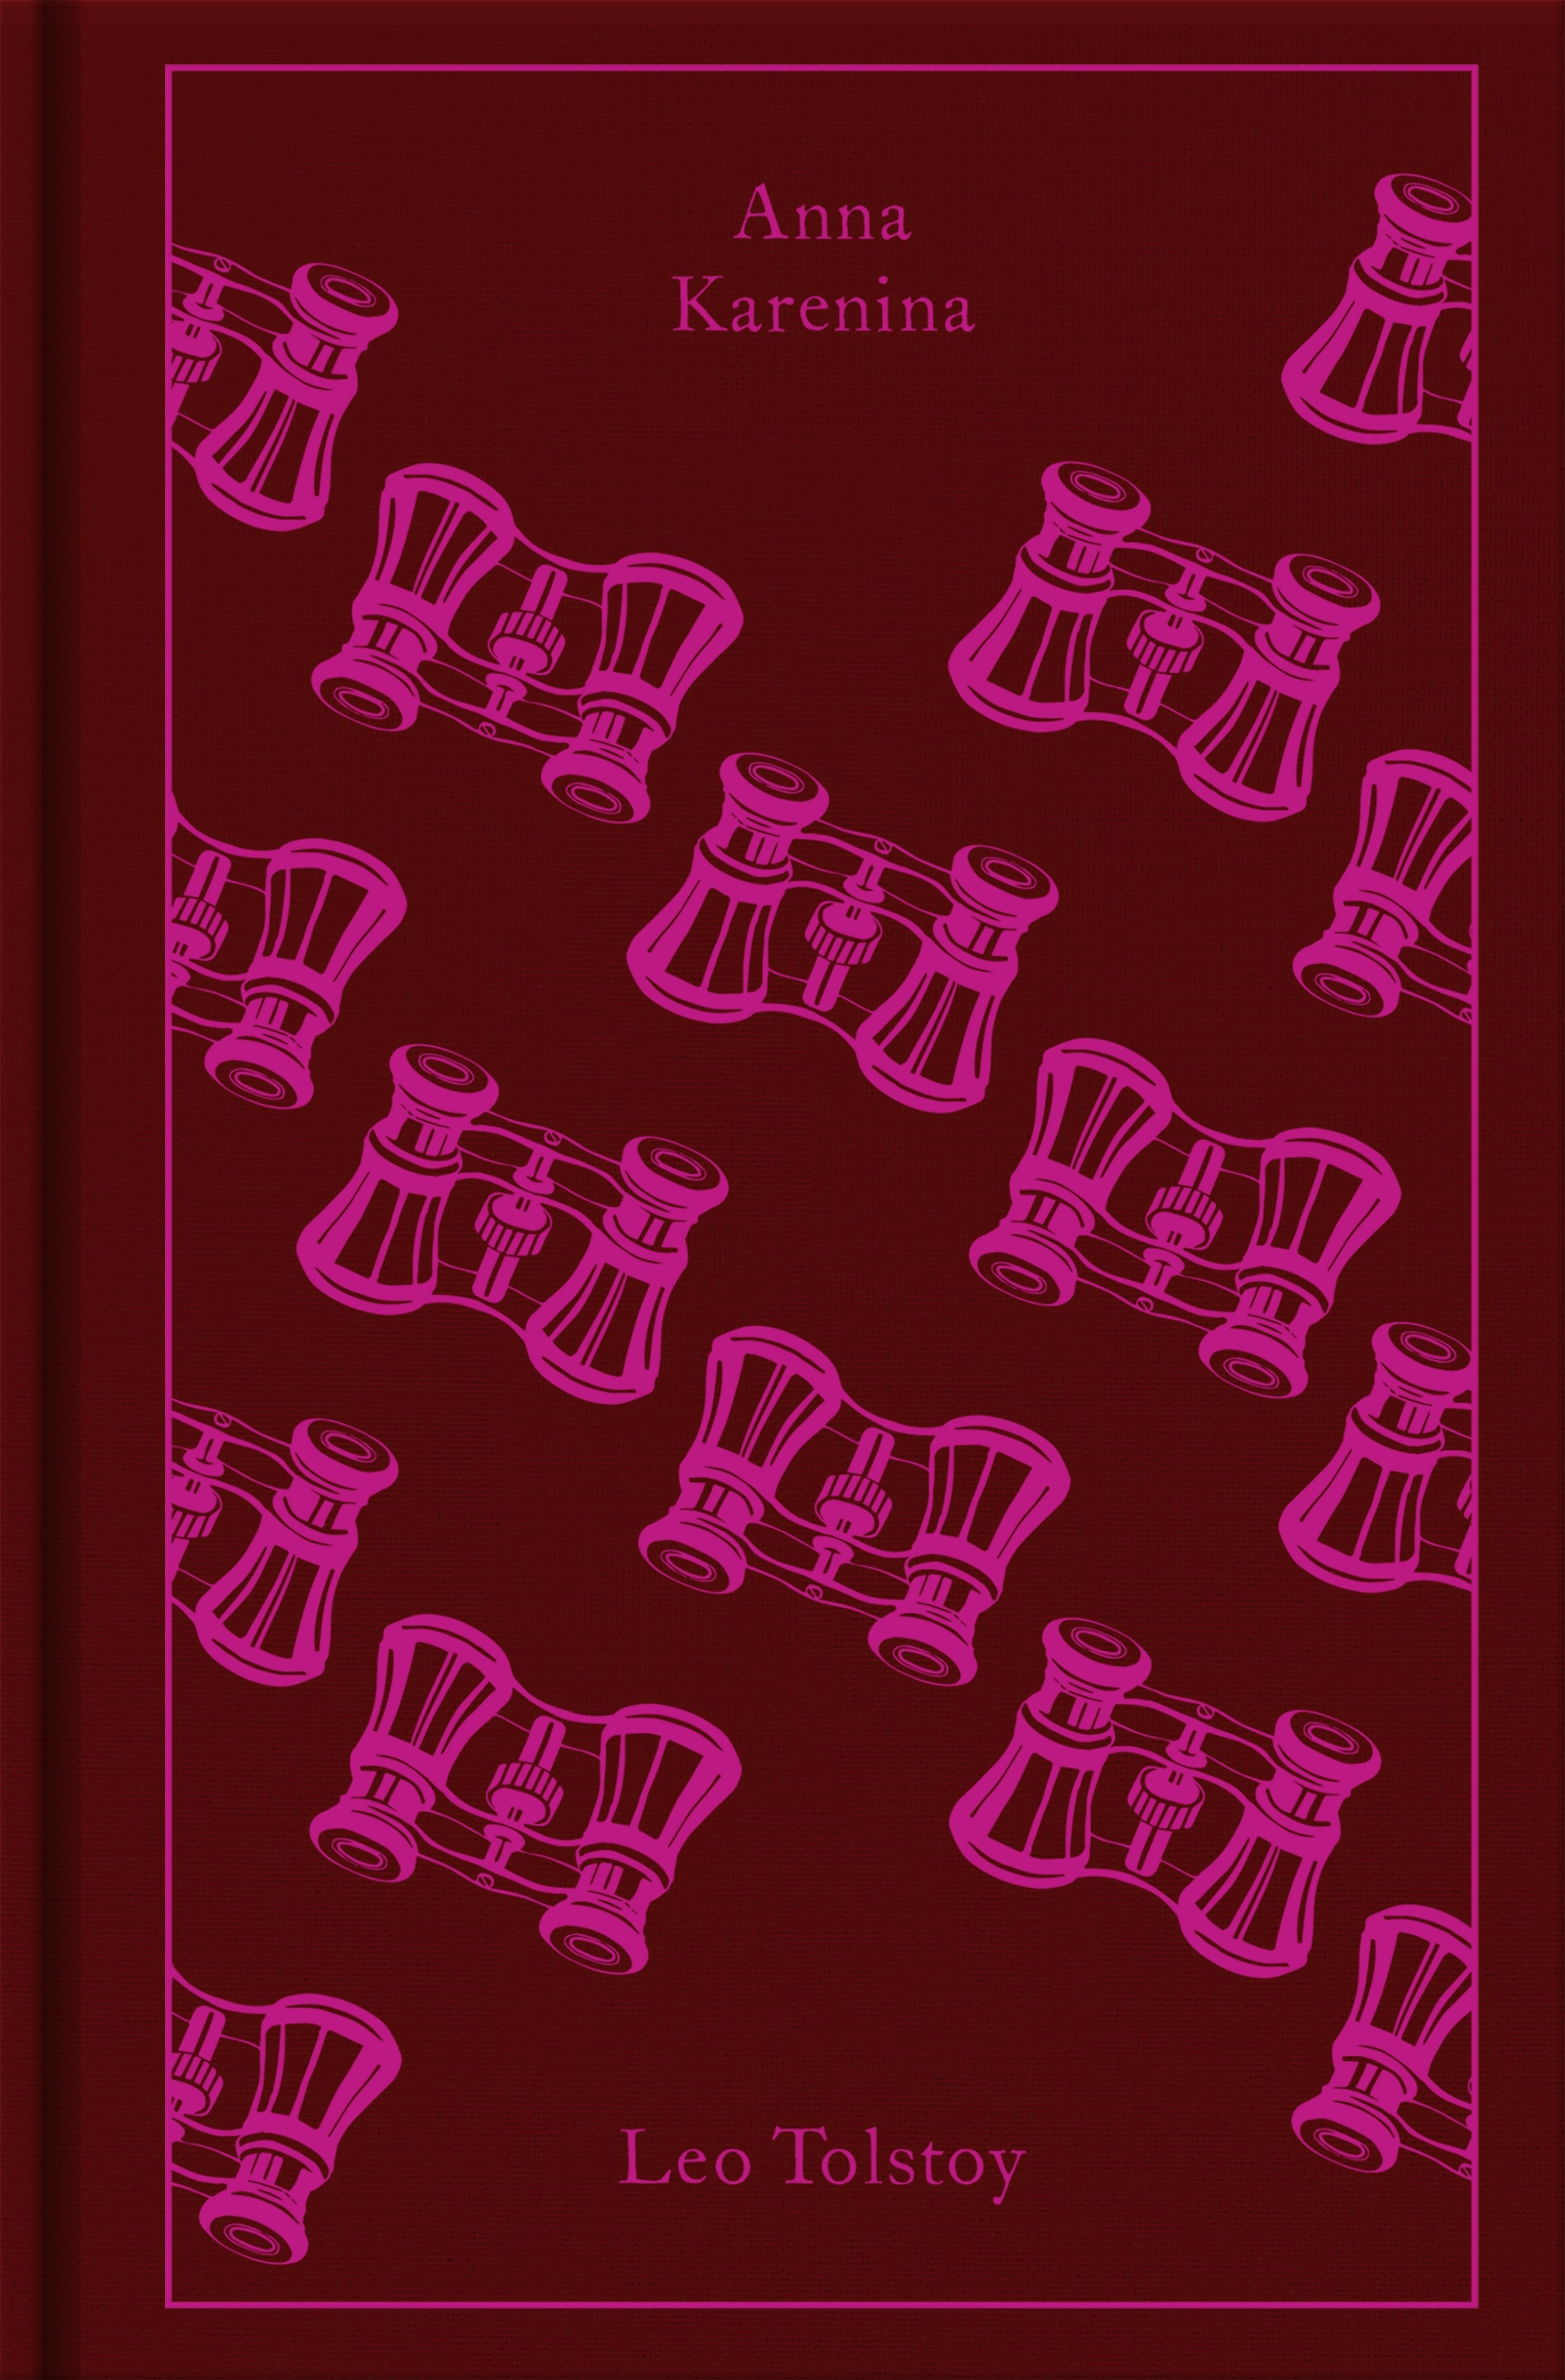 Anna Karenina Cover Book cover anna karenina